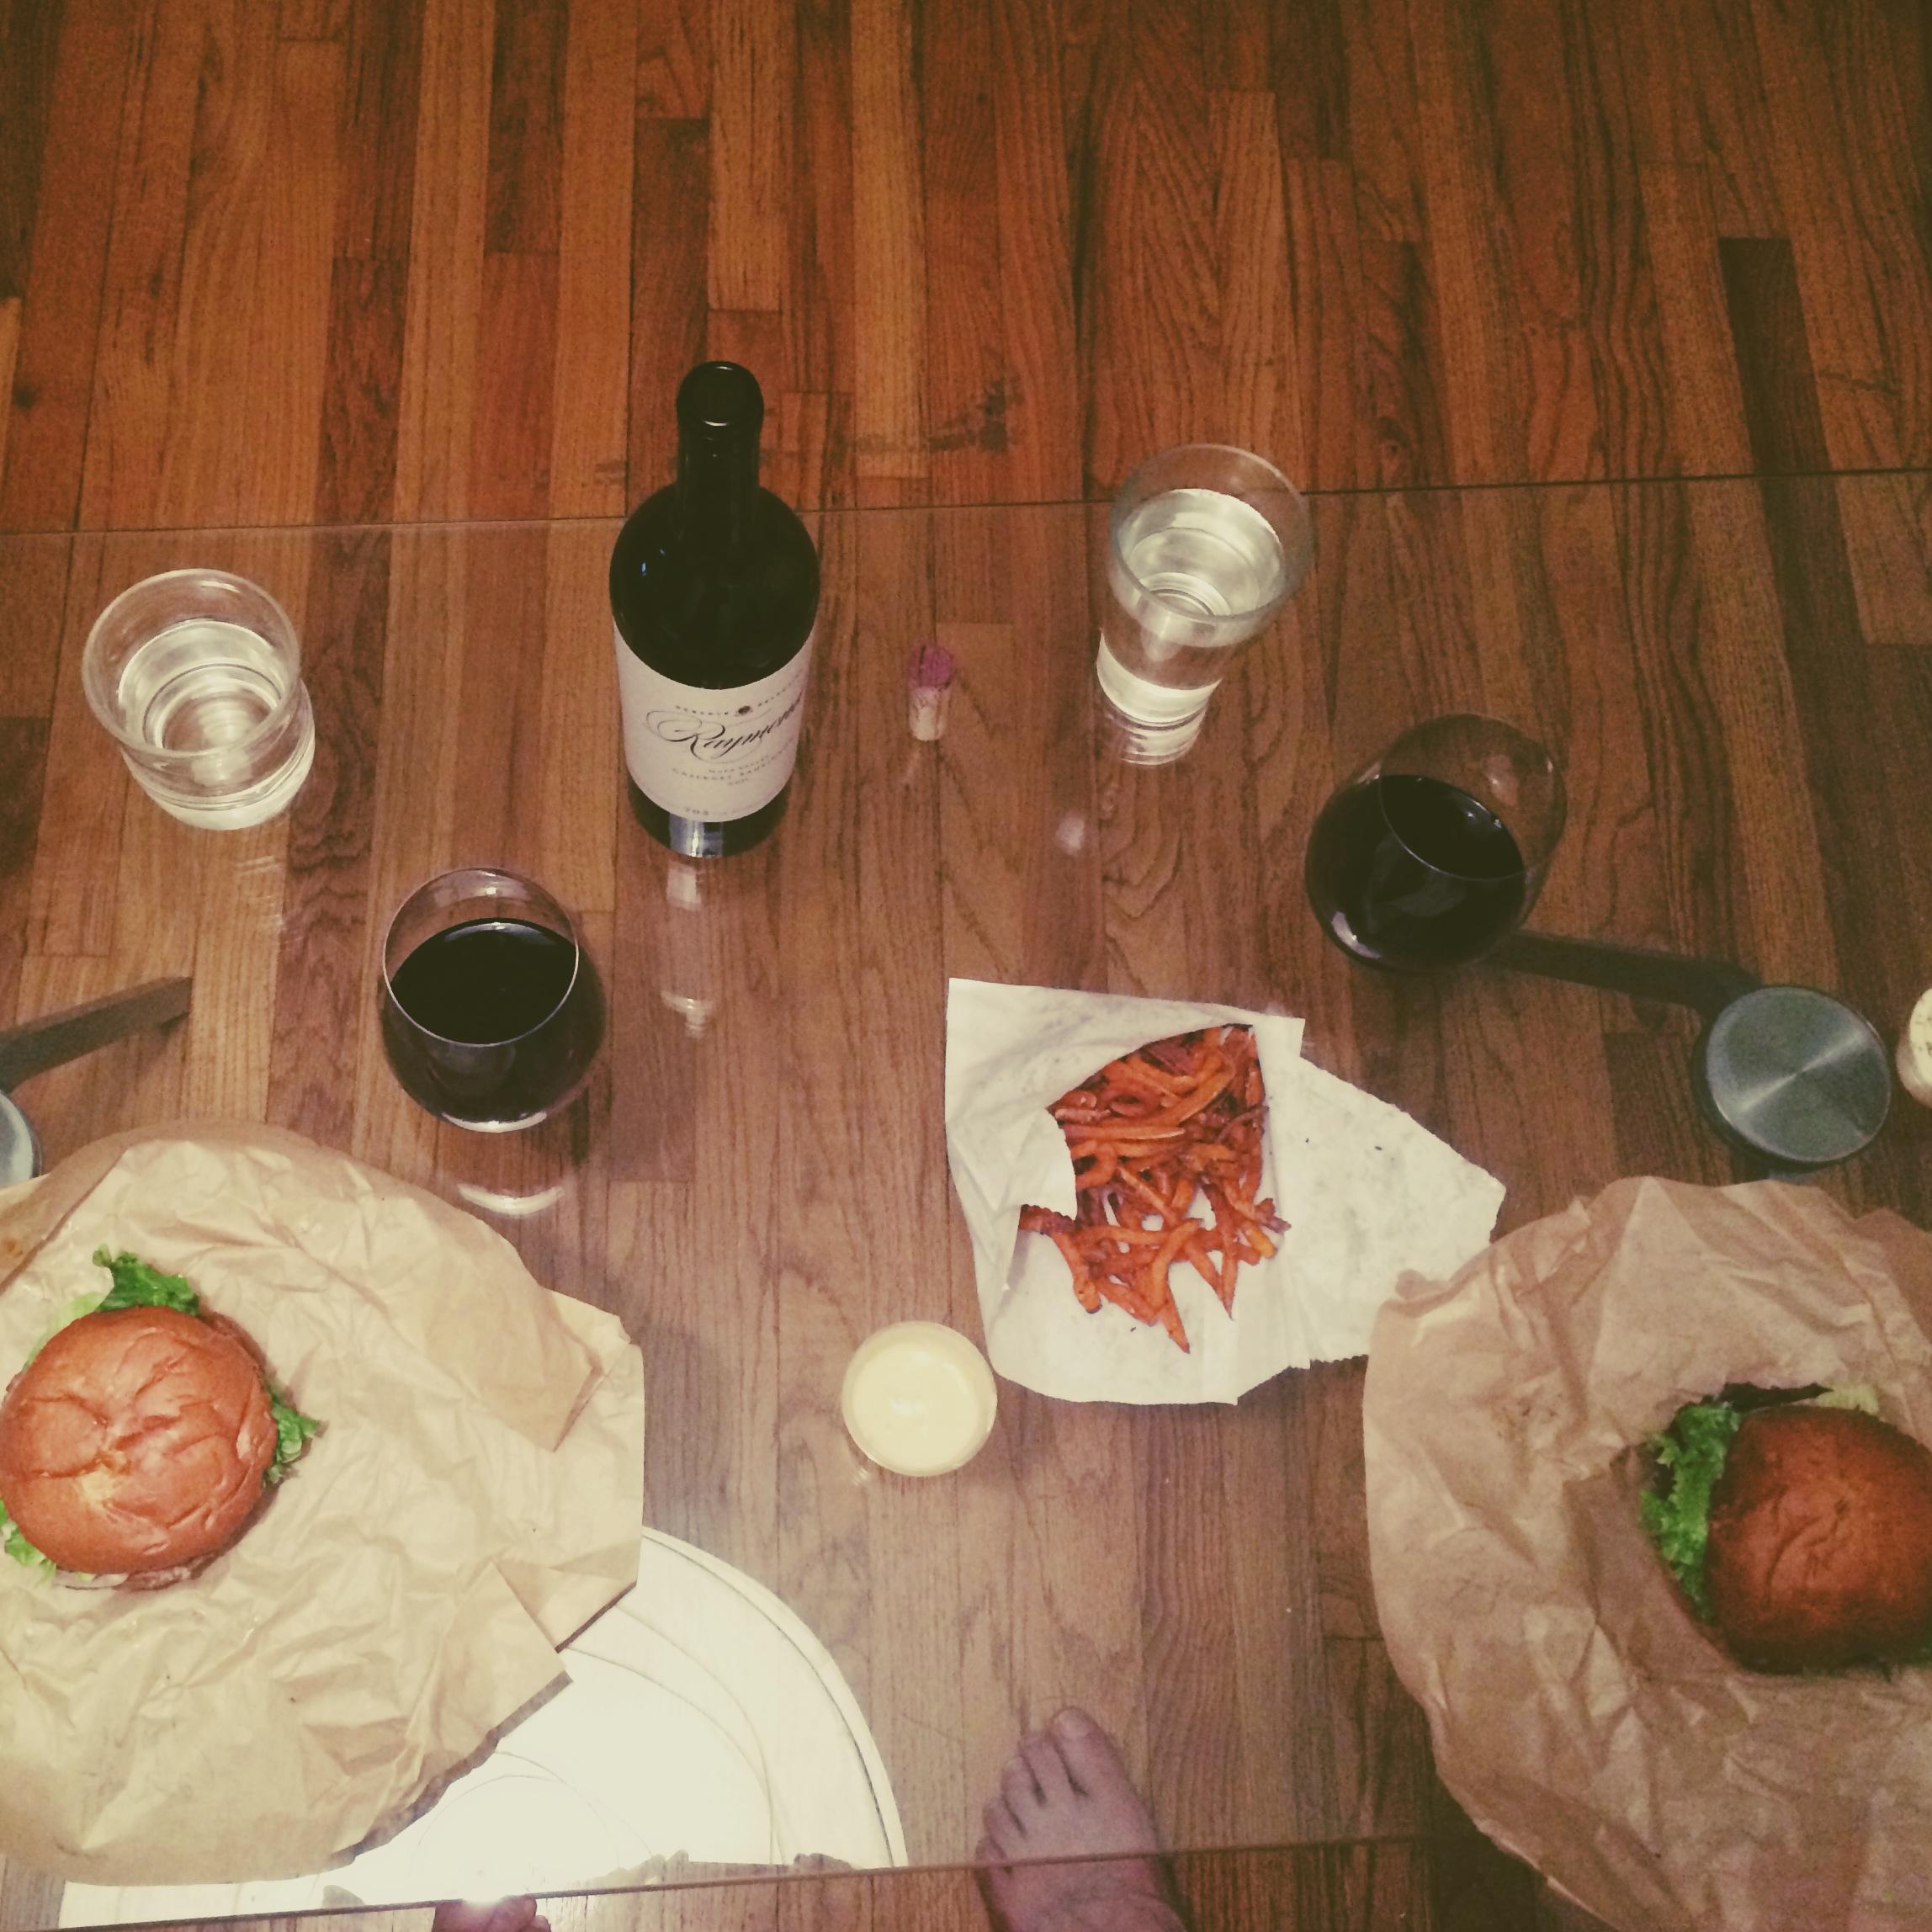 best v-day dinner ever #athome  #redwine #ponoburger #sadweonlygotonesweetpotatofries #hellosweethusbandfoot